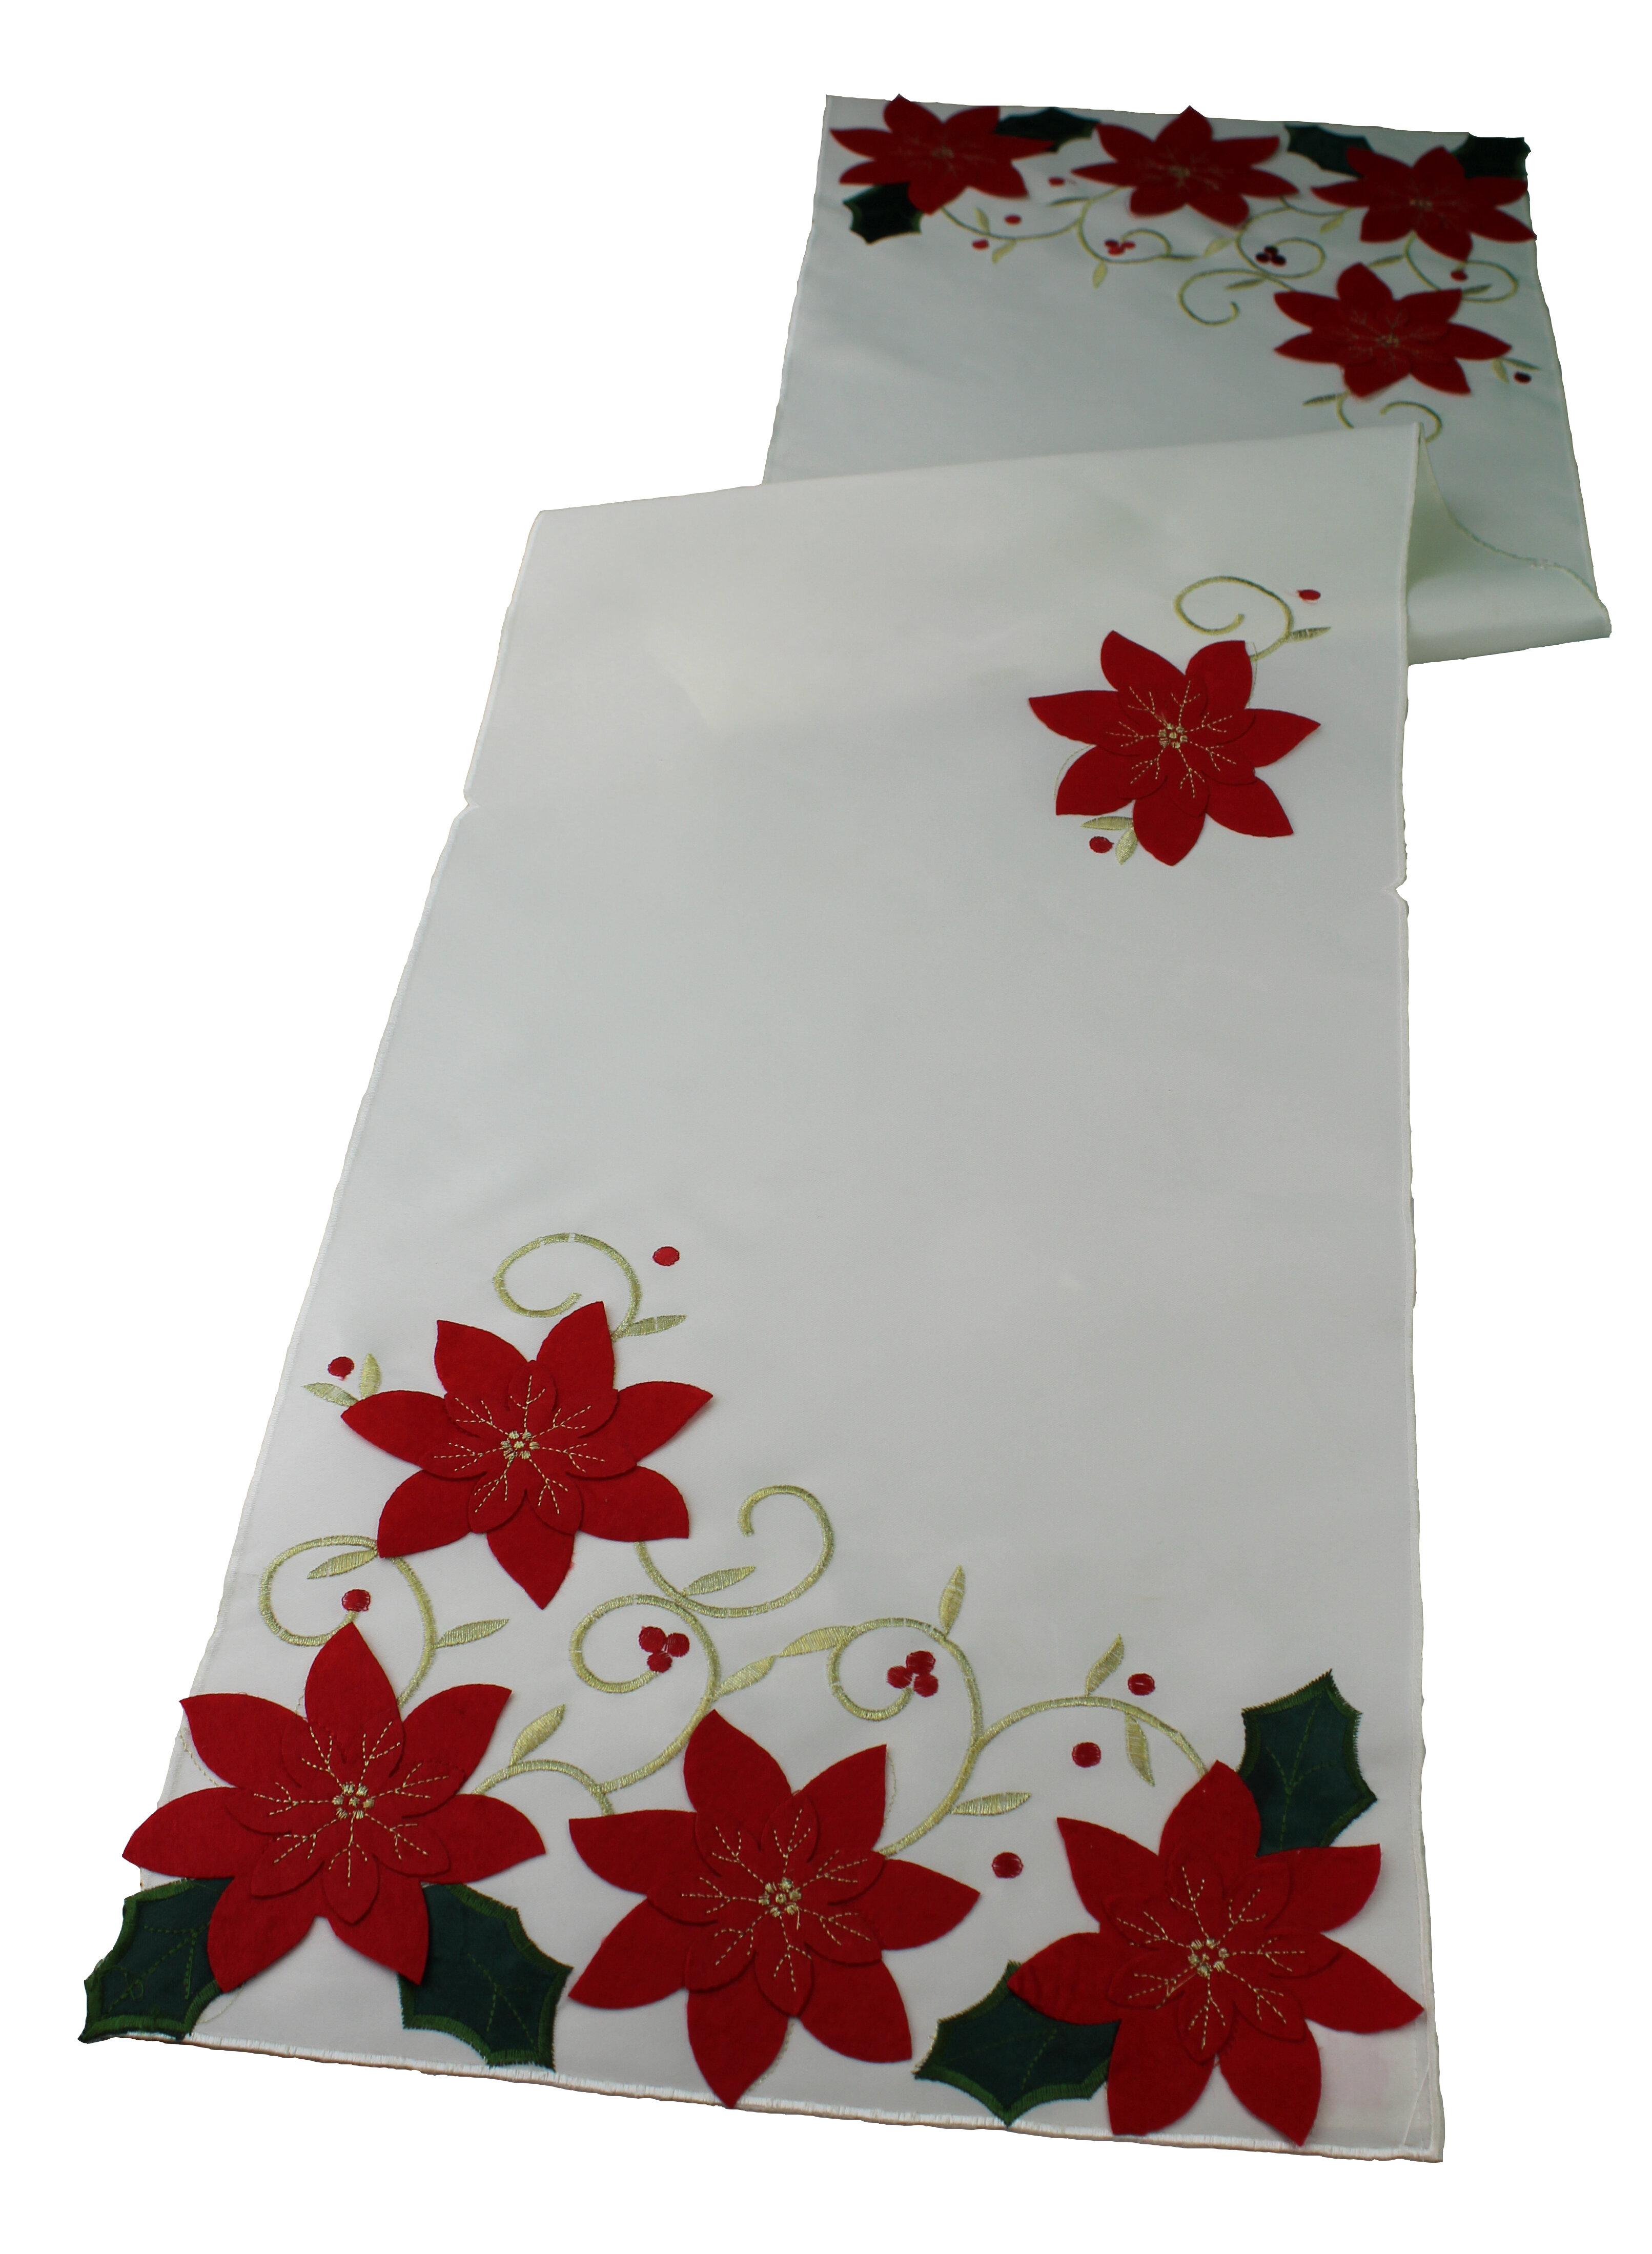 The Holiday Aisle Puma Poinsettias Holiday Christmas Decorative Table Runner  U0026 Reviews | Wayfair